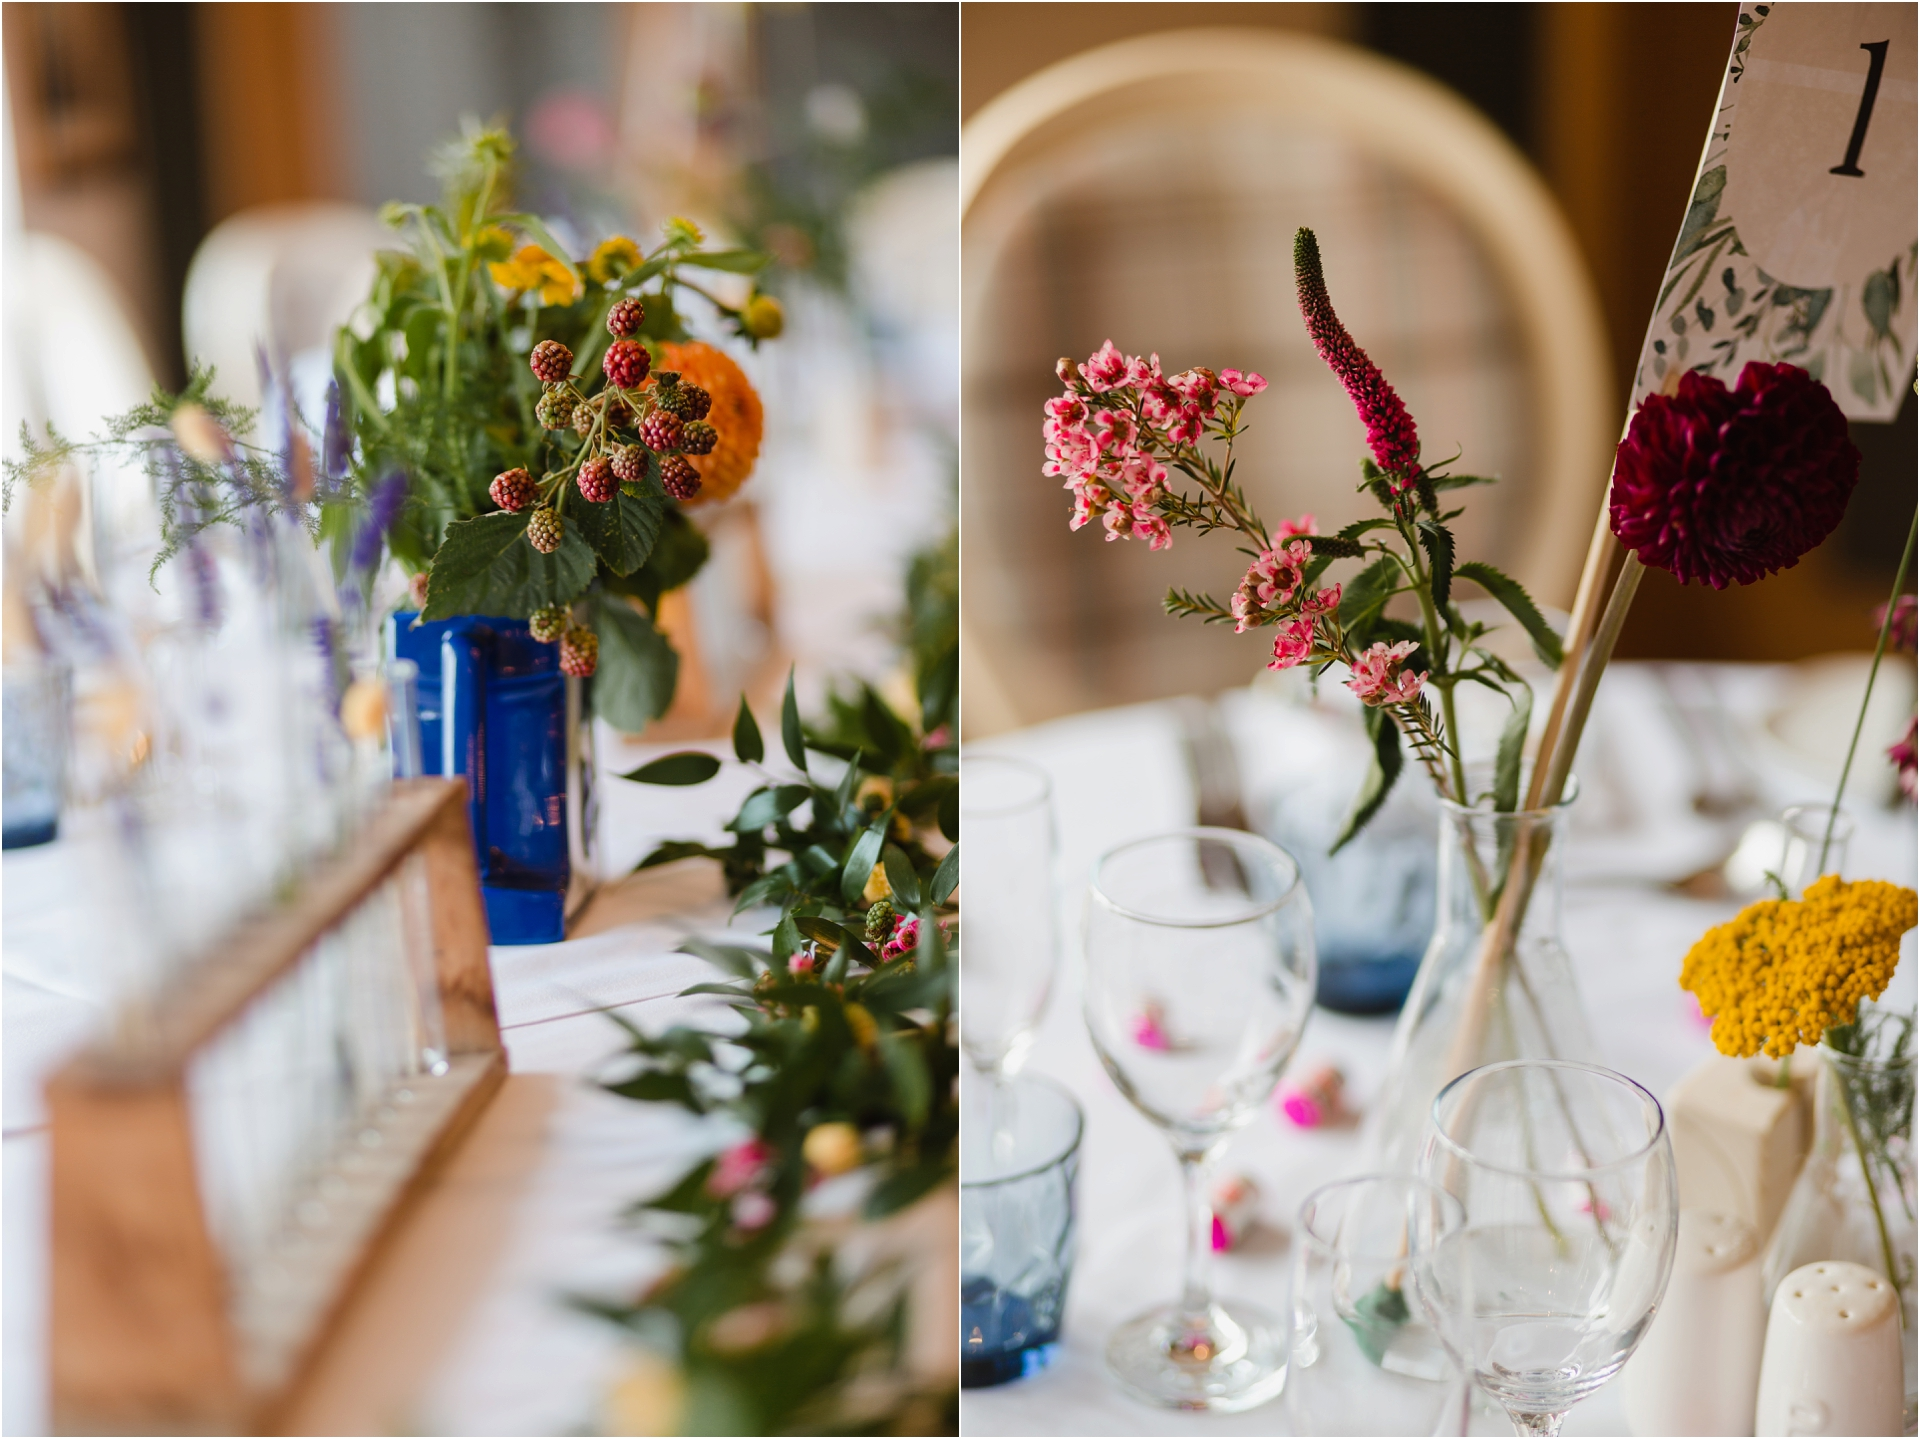 Chemistry themed wedding decor